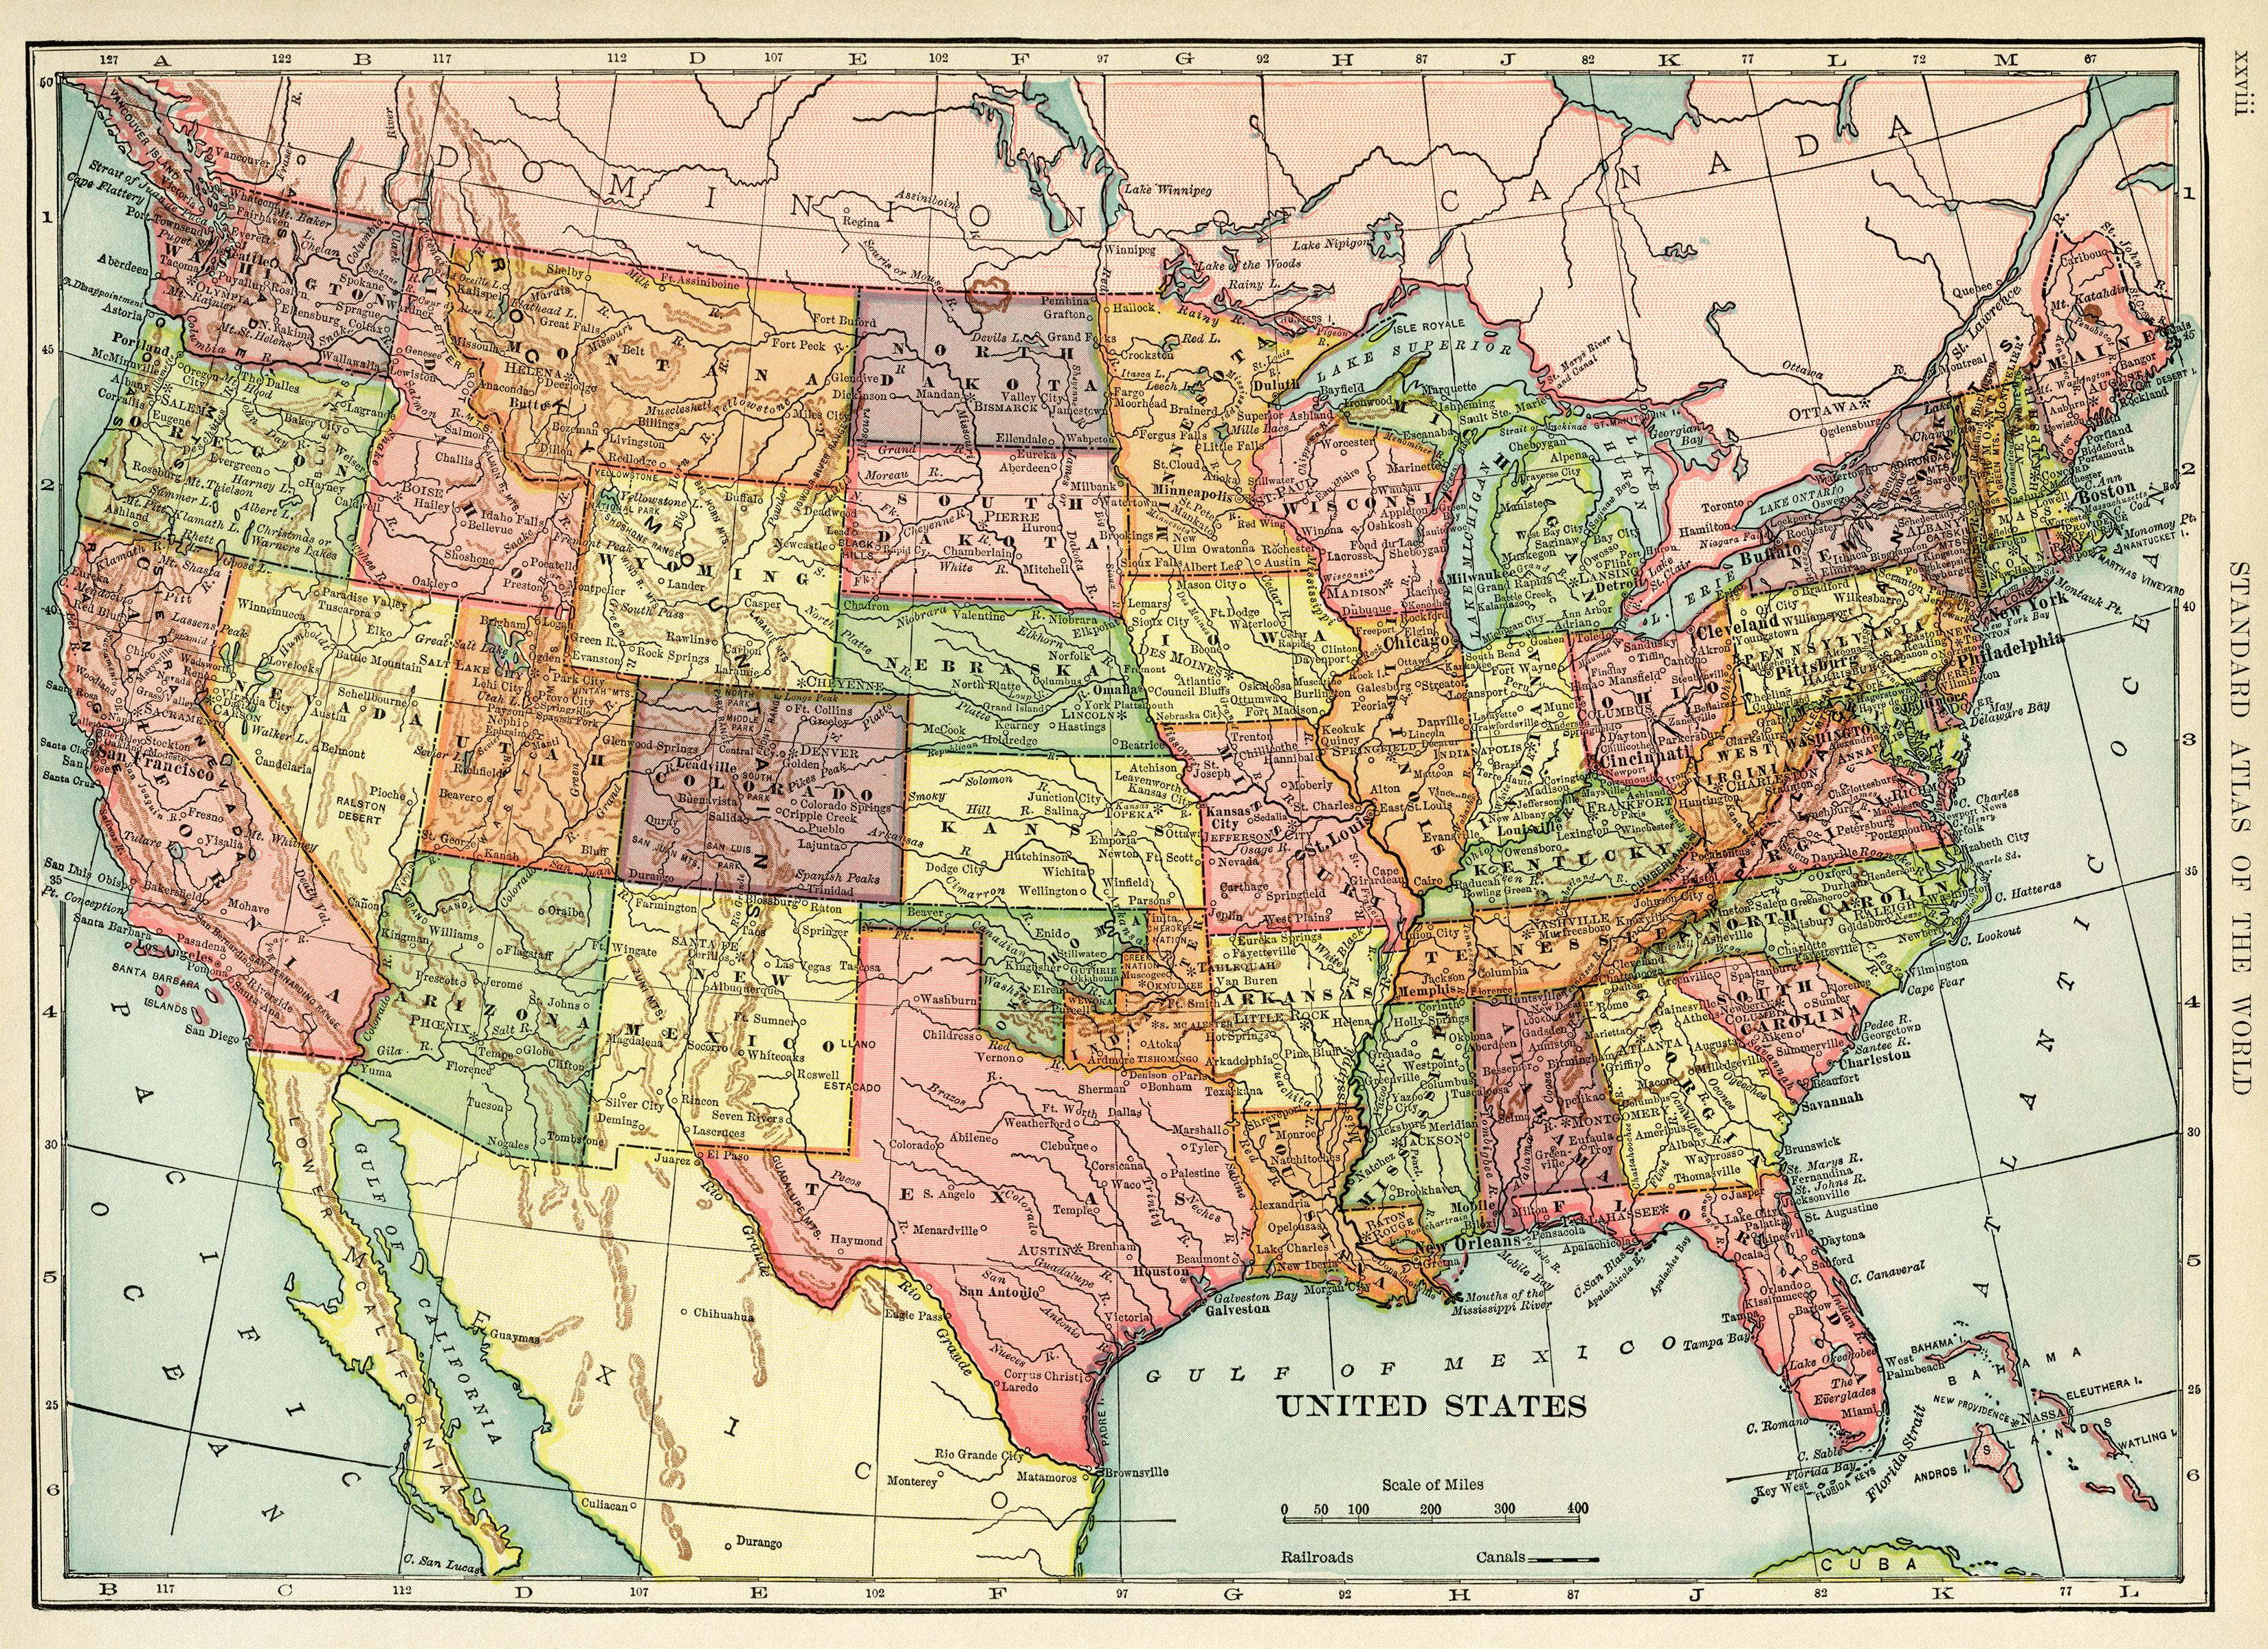 United States Map, Vintage Map Download, Antique Map, History - Vintage Map Printable